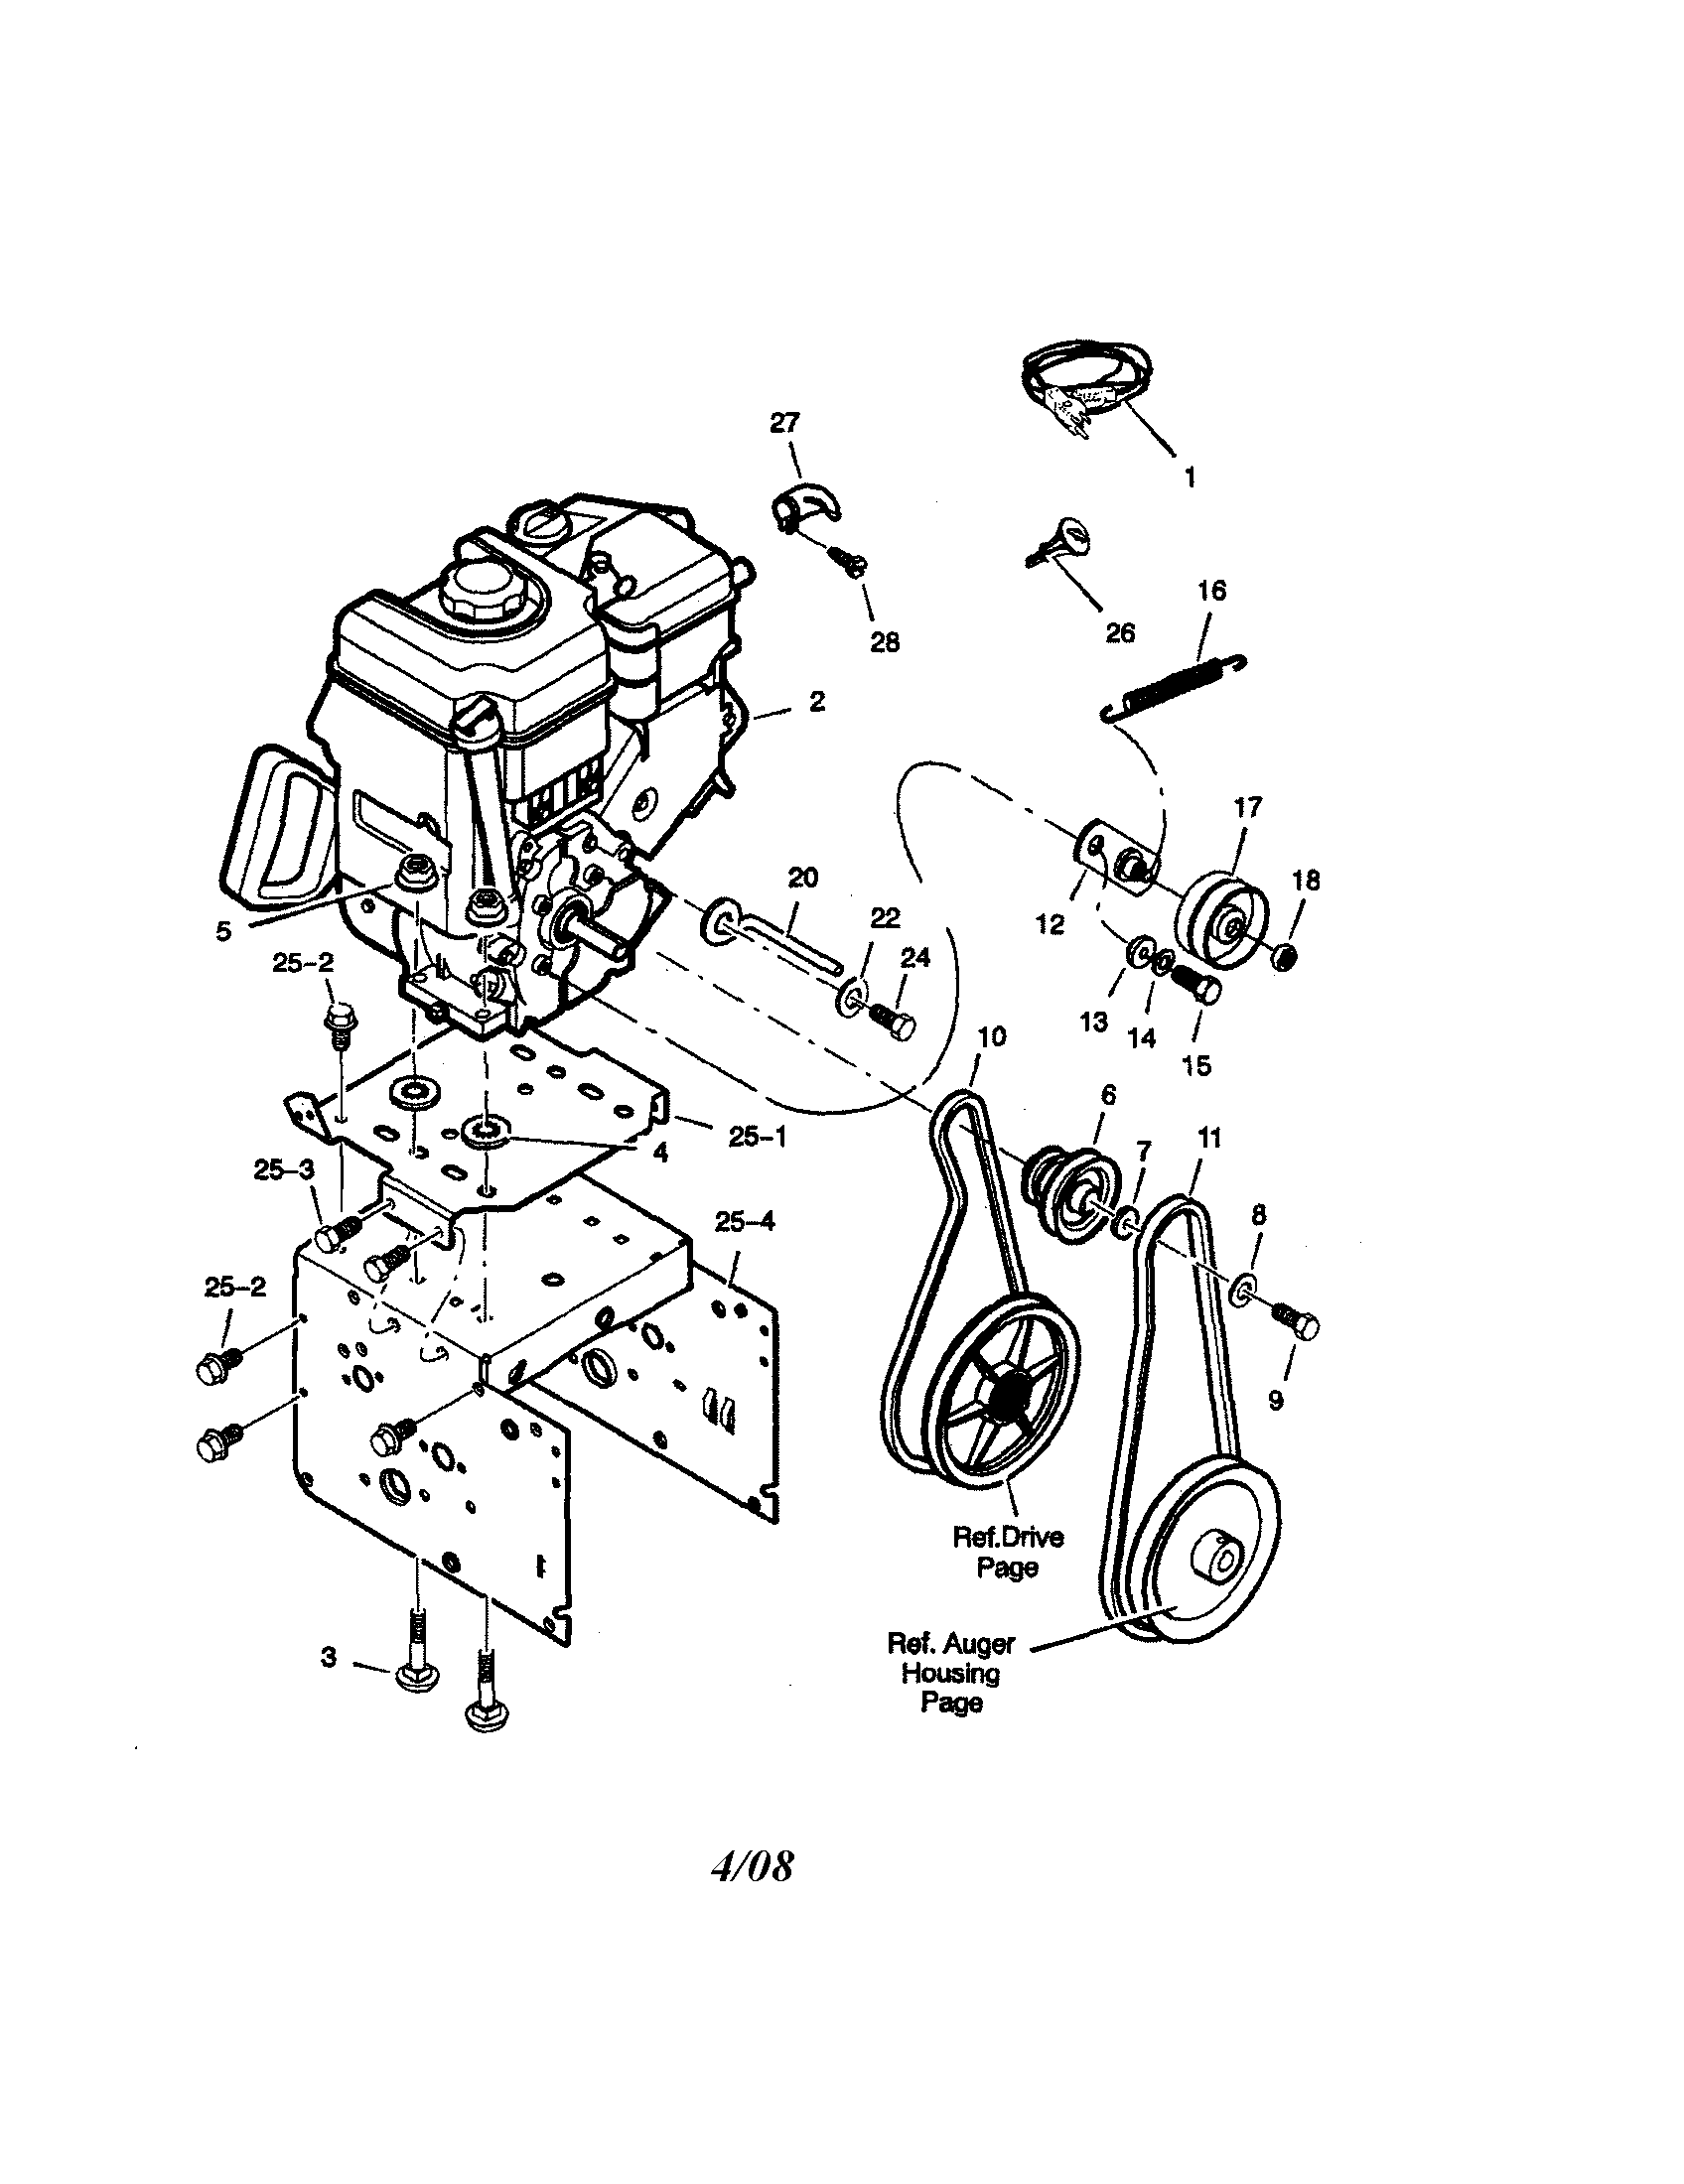 Craftsman model 536881851 snowthrower, gas genuine parts